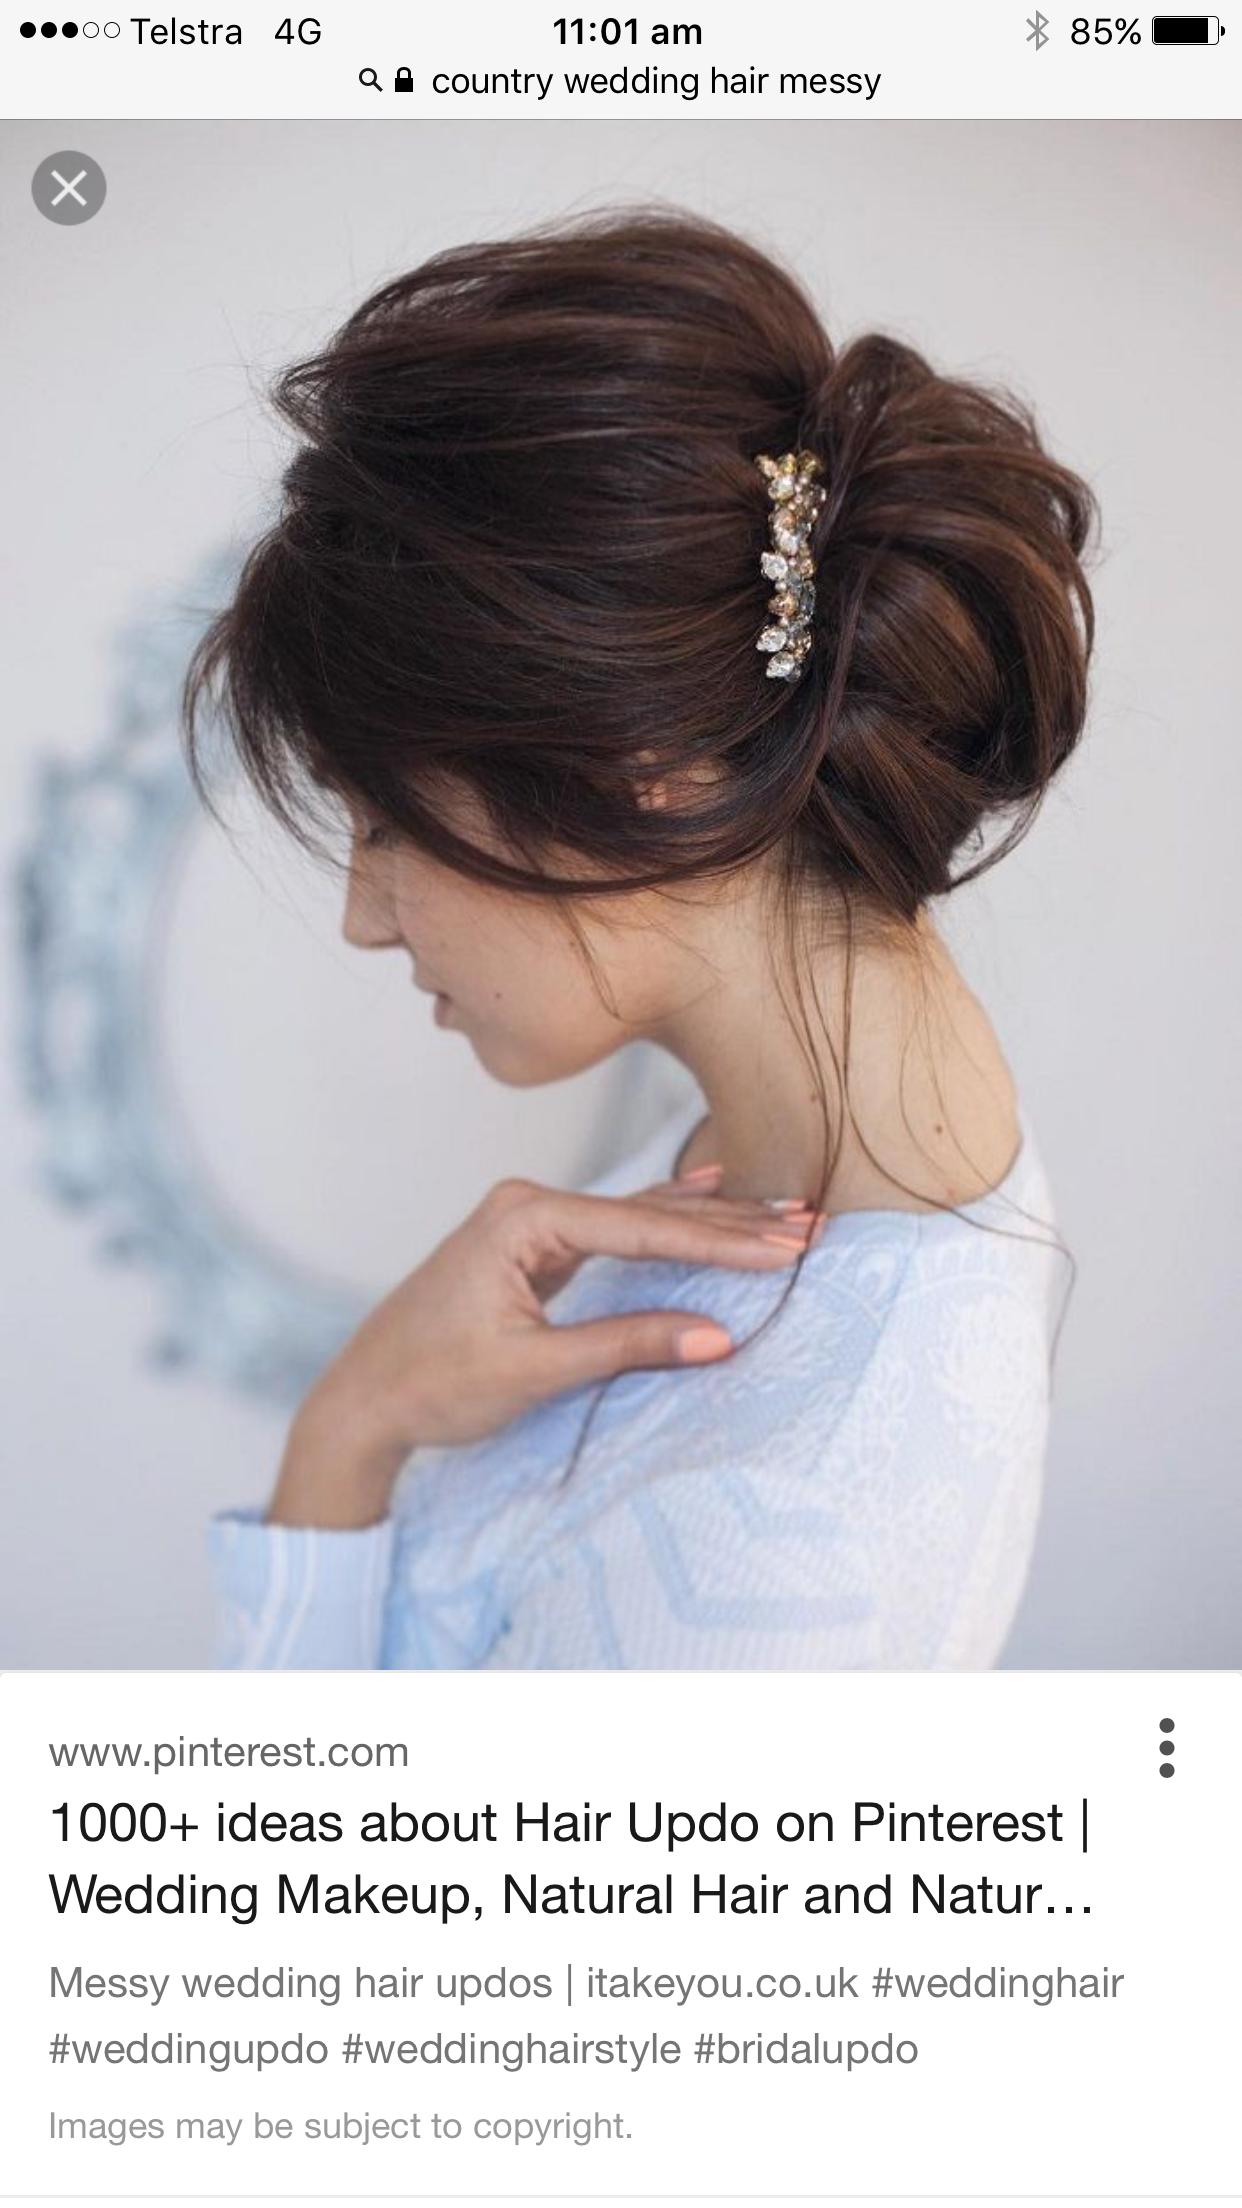 pin by arjan on hairstyle in 2019 | messy wedding hair